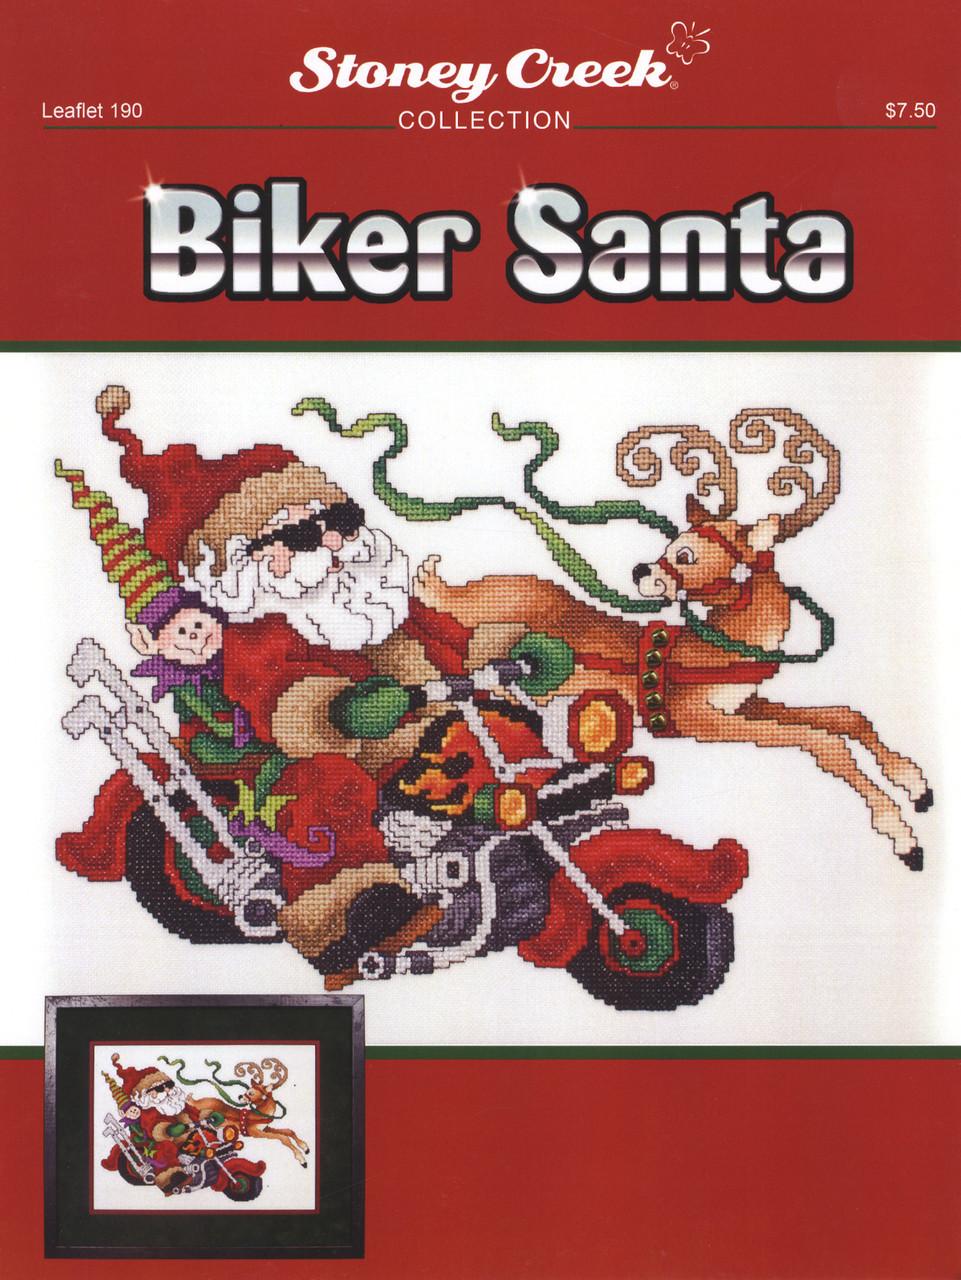 Stoney Creek - Biker Santa